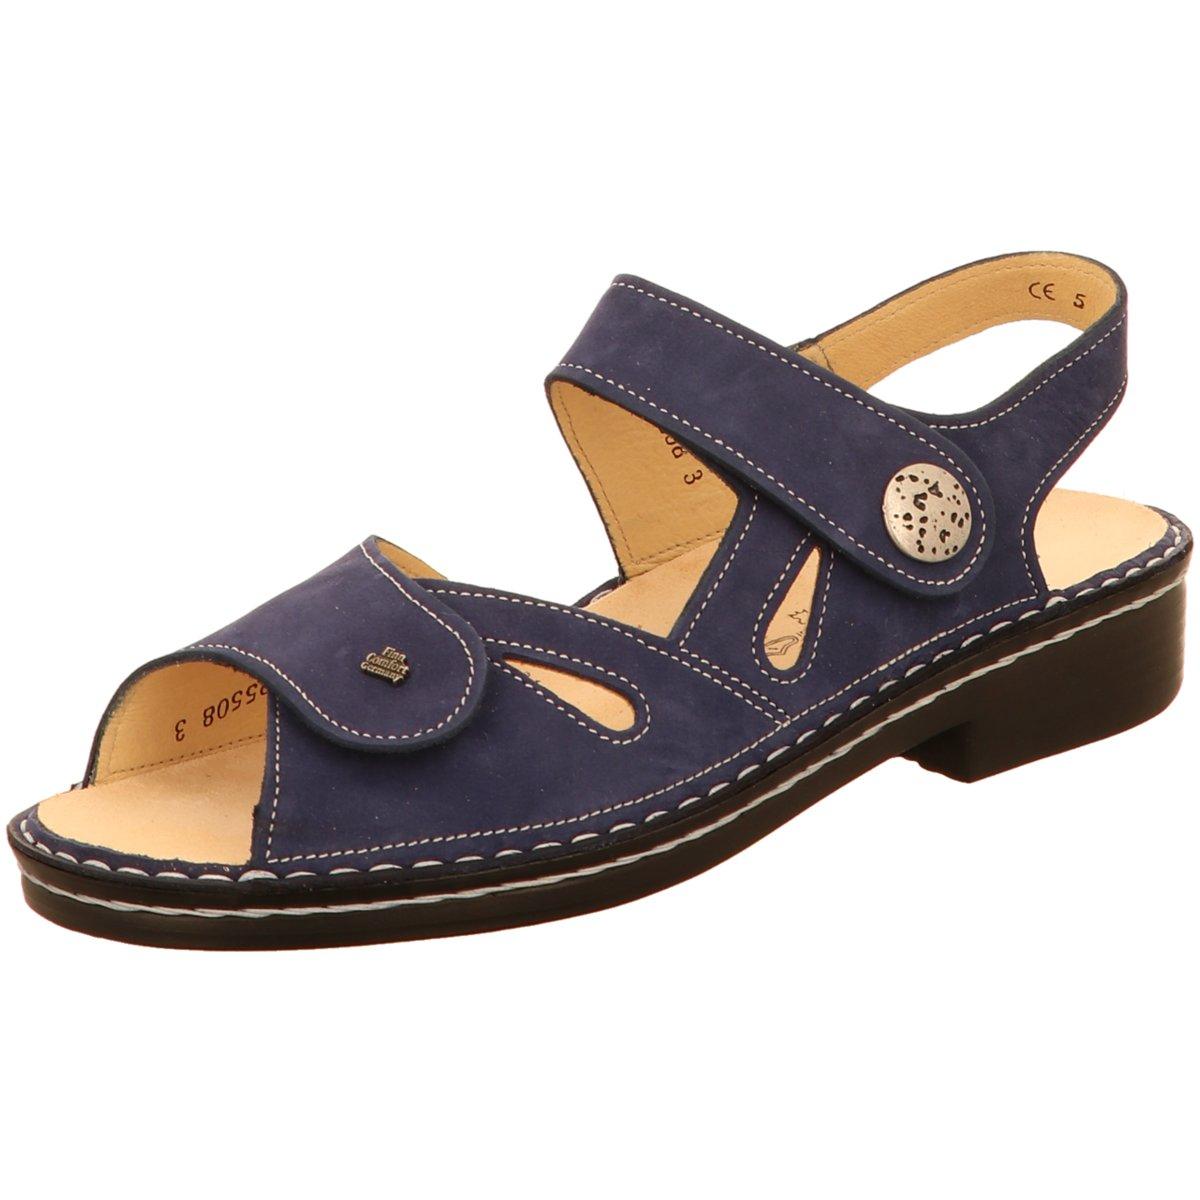 FinnComfort Damänner Sandaletten Costa (blau) Sandale mit